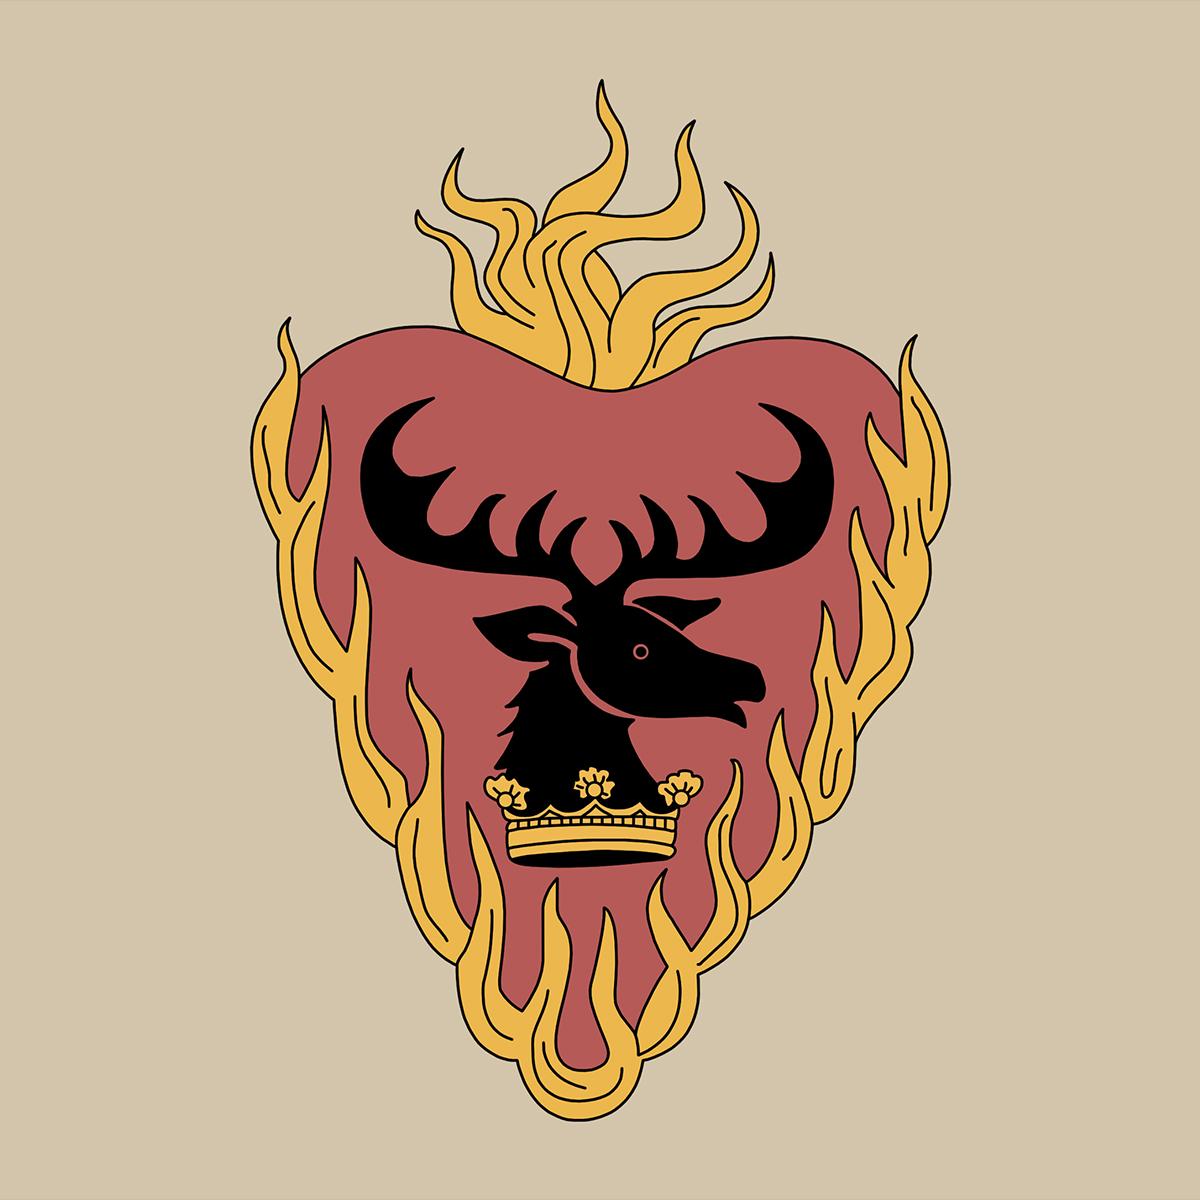 House-Baratheon-of-Dragonstone-heraldry.jpg